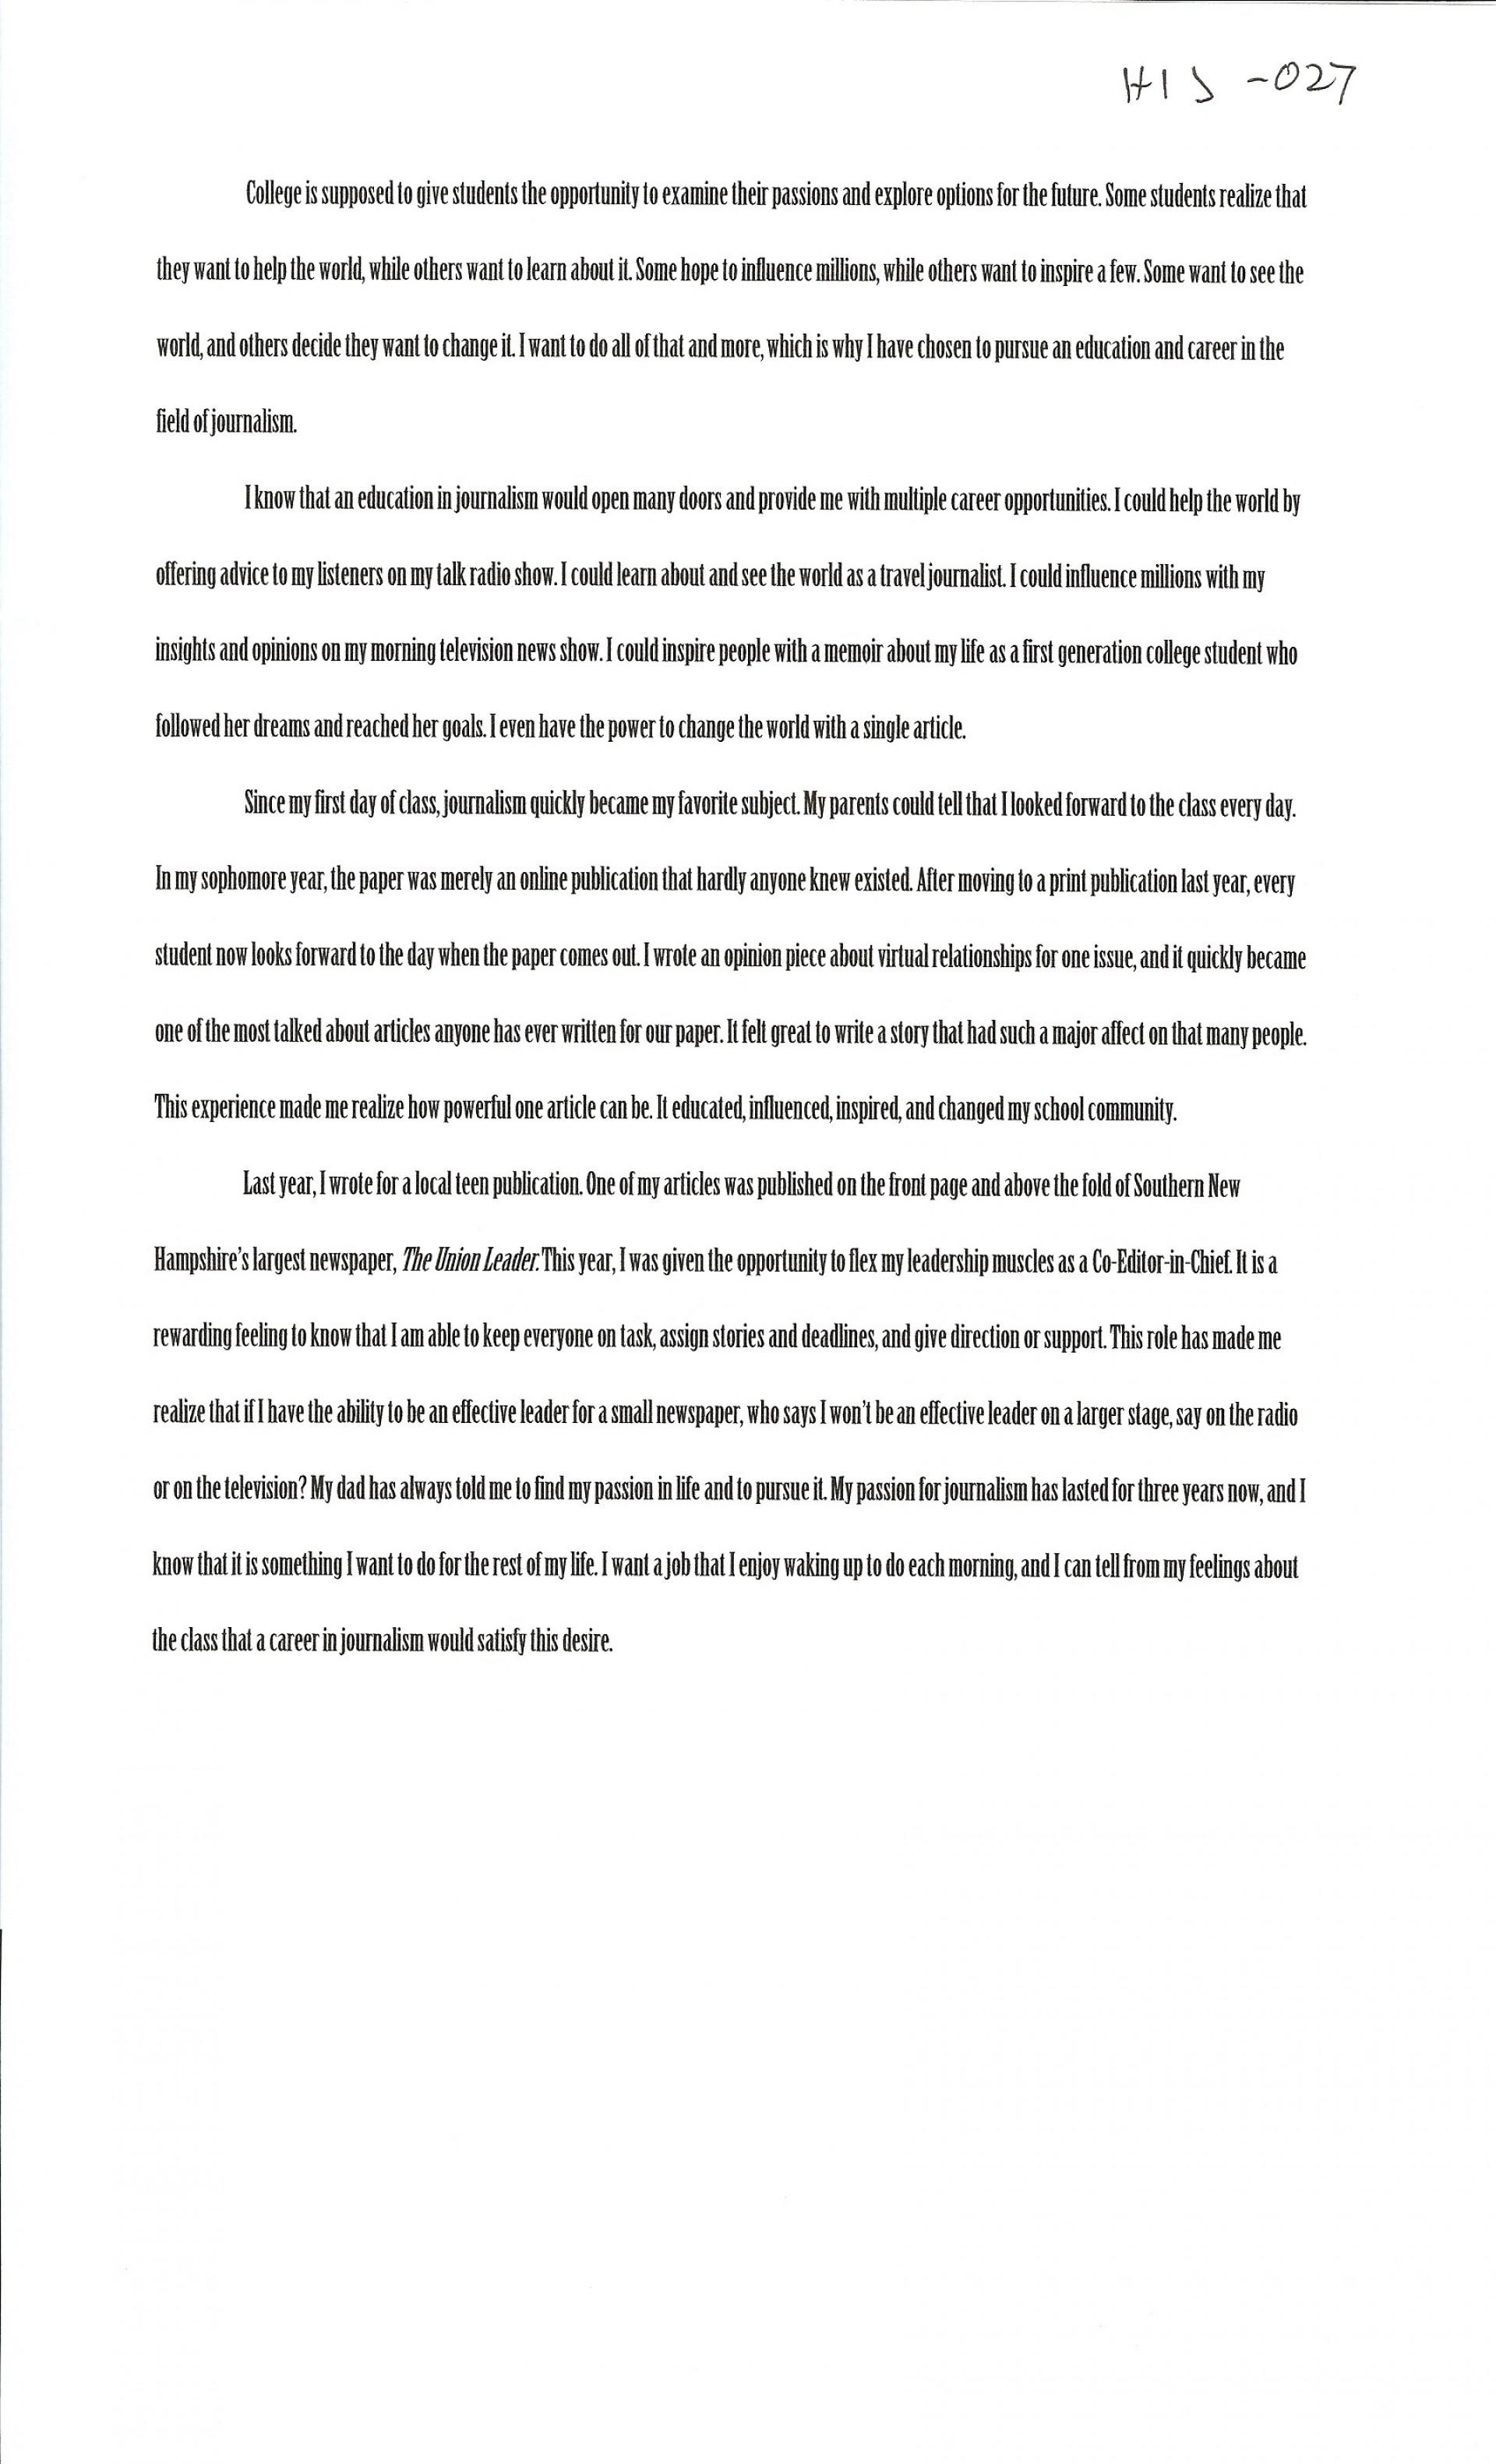 001 Essay Example Alexa Serrecchia Questbridge Stirring Essays Examples Finalist National College Match Prompts 1920